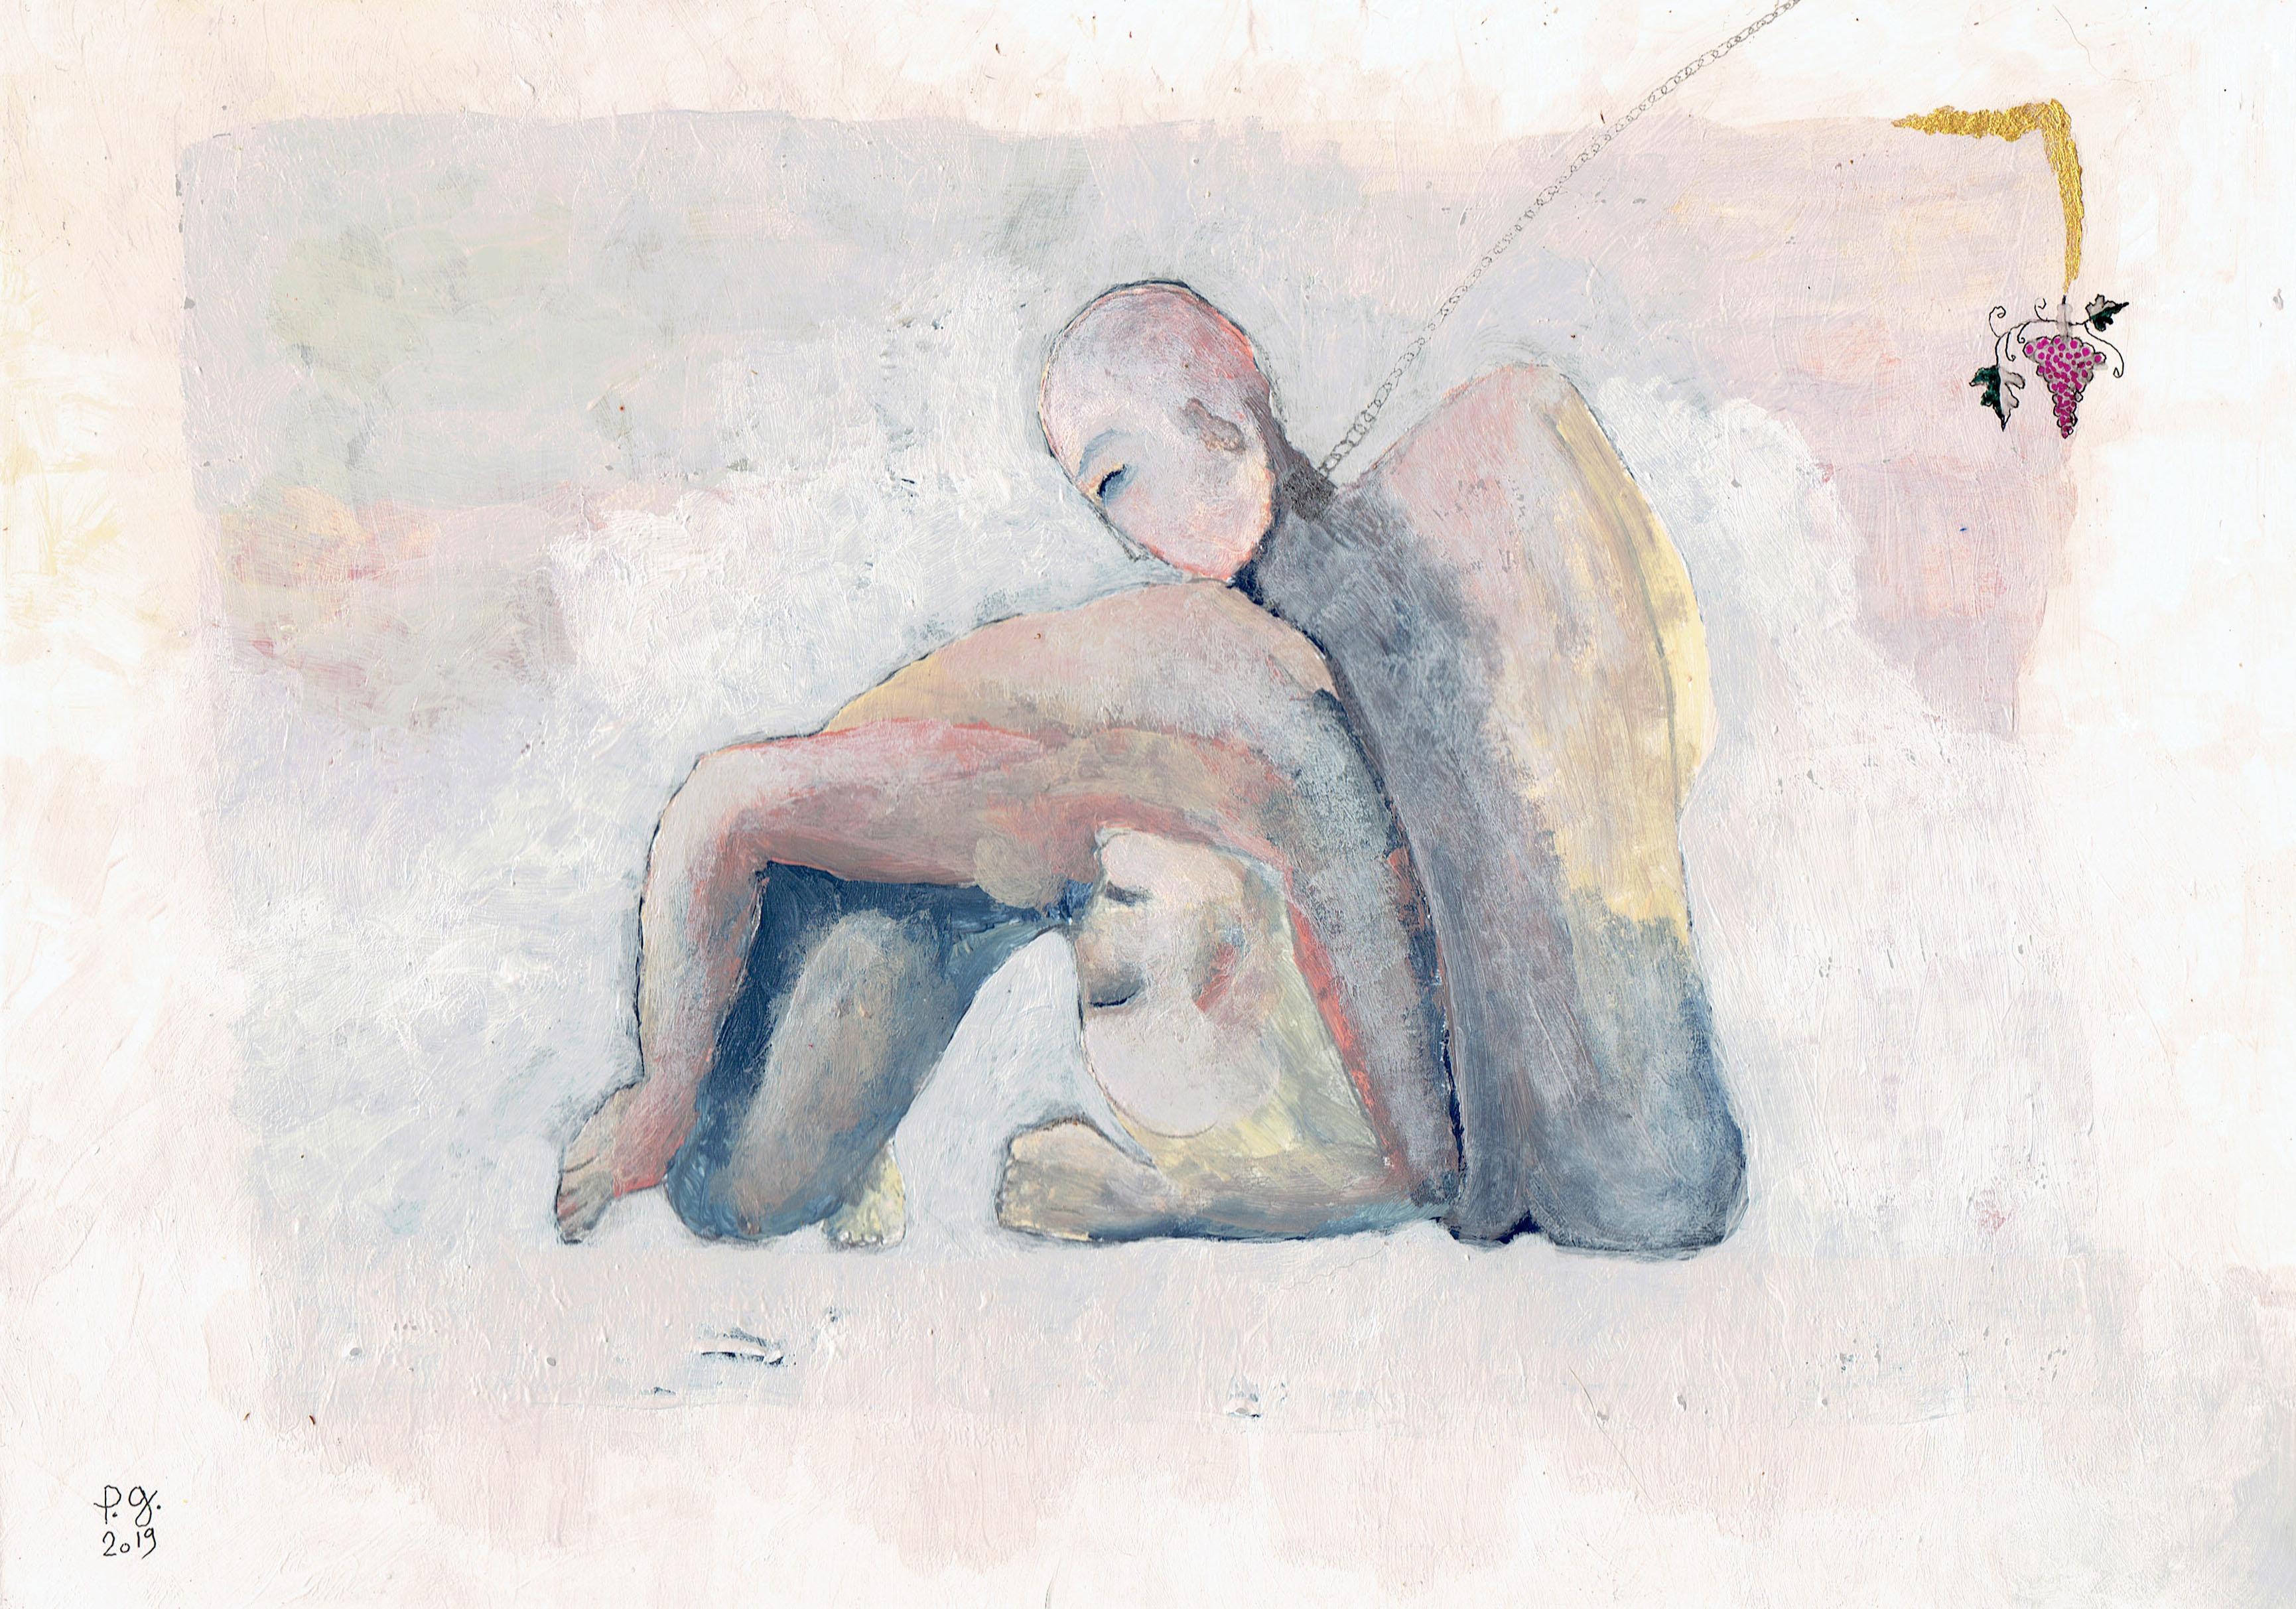 """Euphoria"" - patrick gourgouillat - 2019"